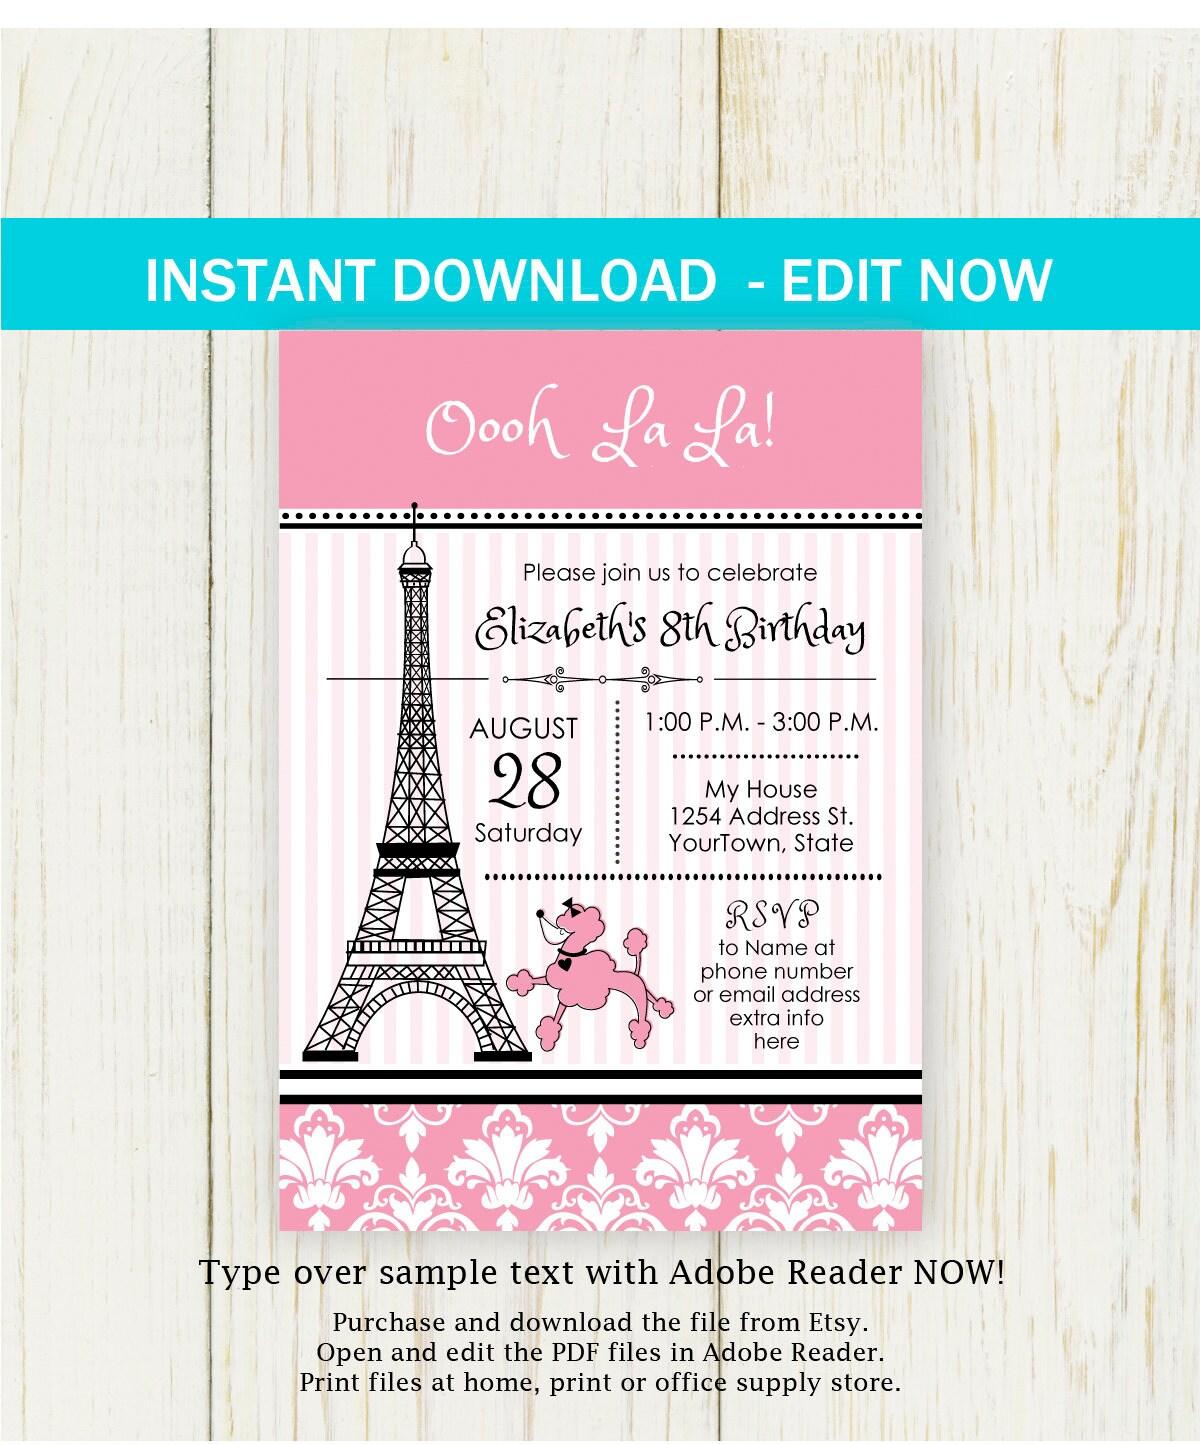 Paris Birthday Invitation - EDIT NOW - Paris Birthday Party ...